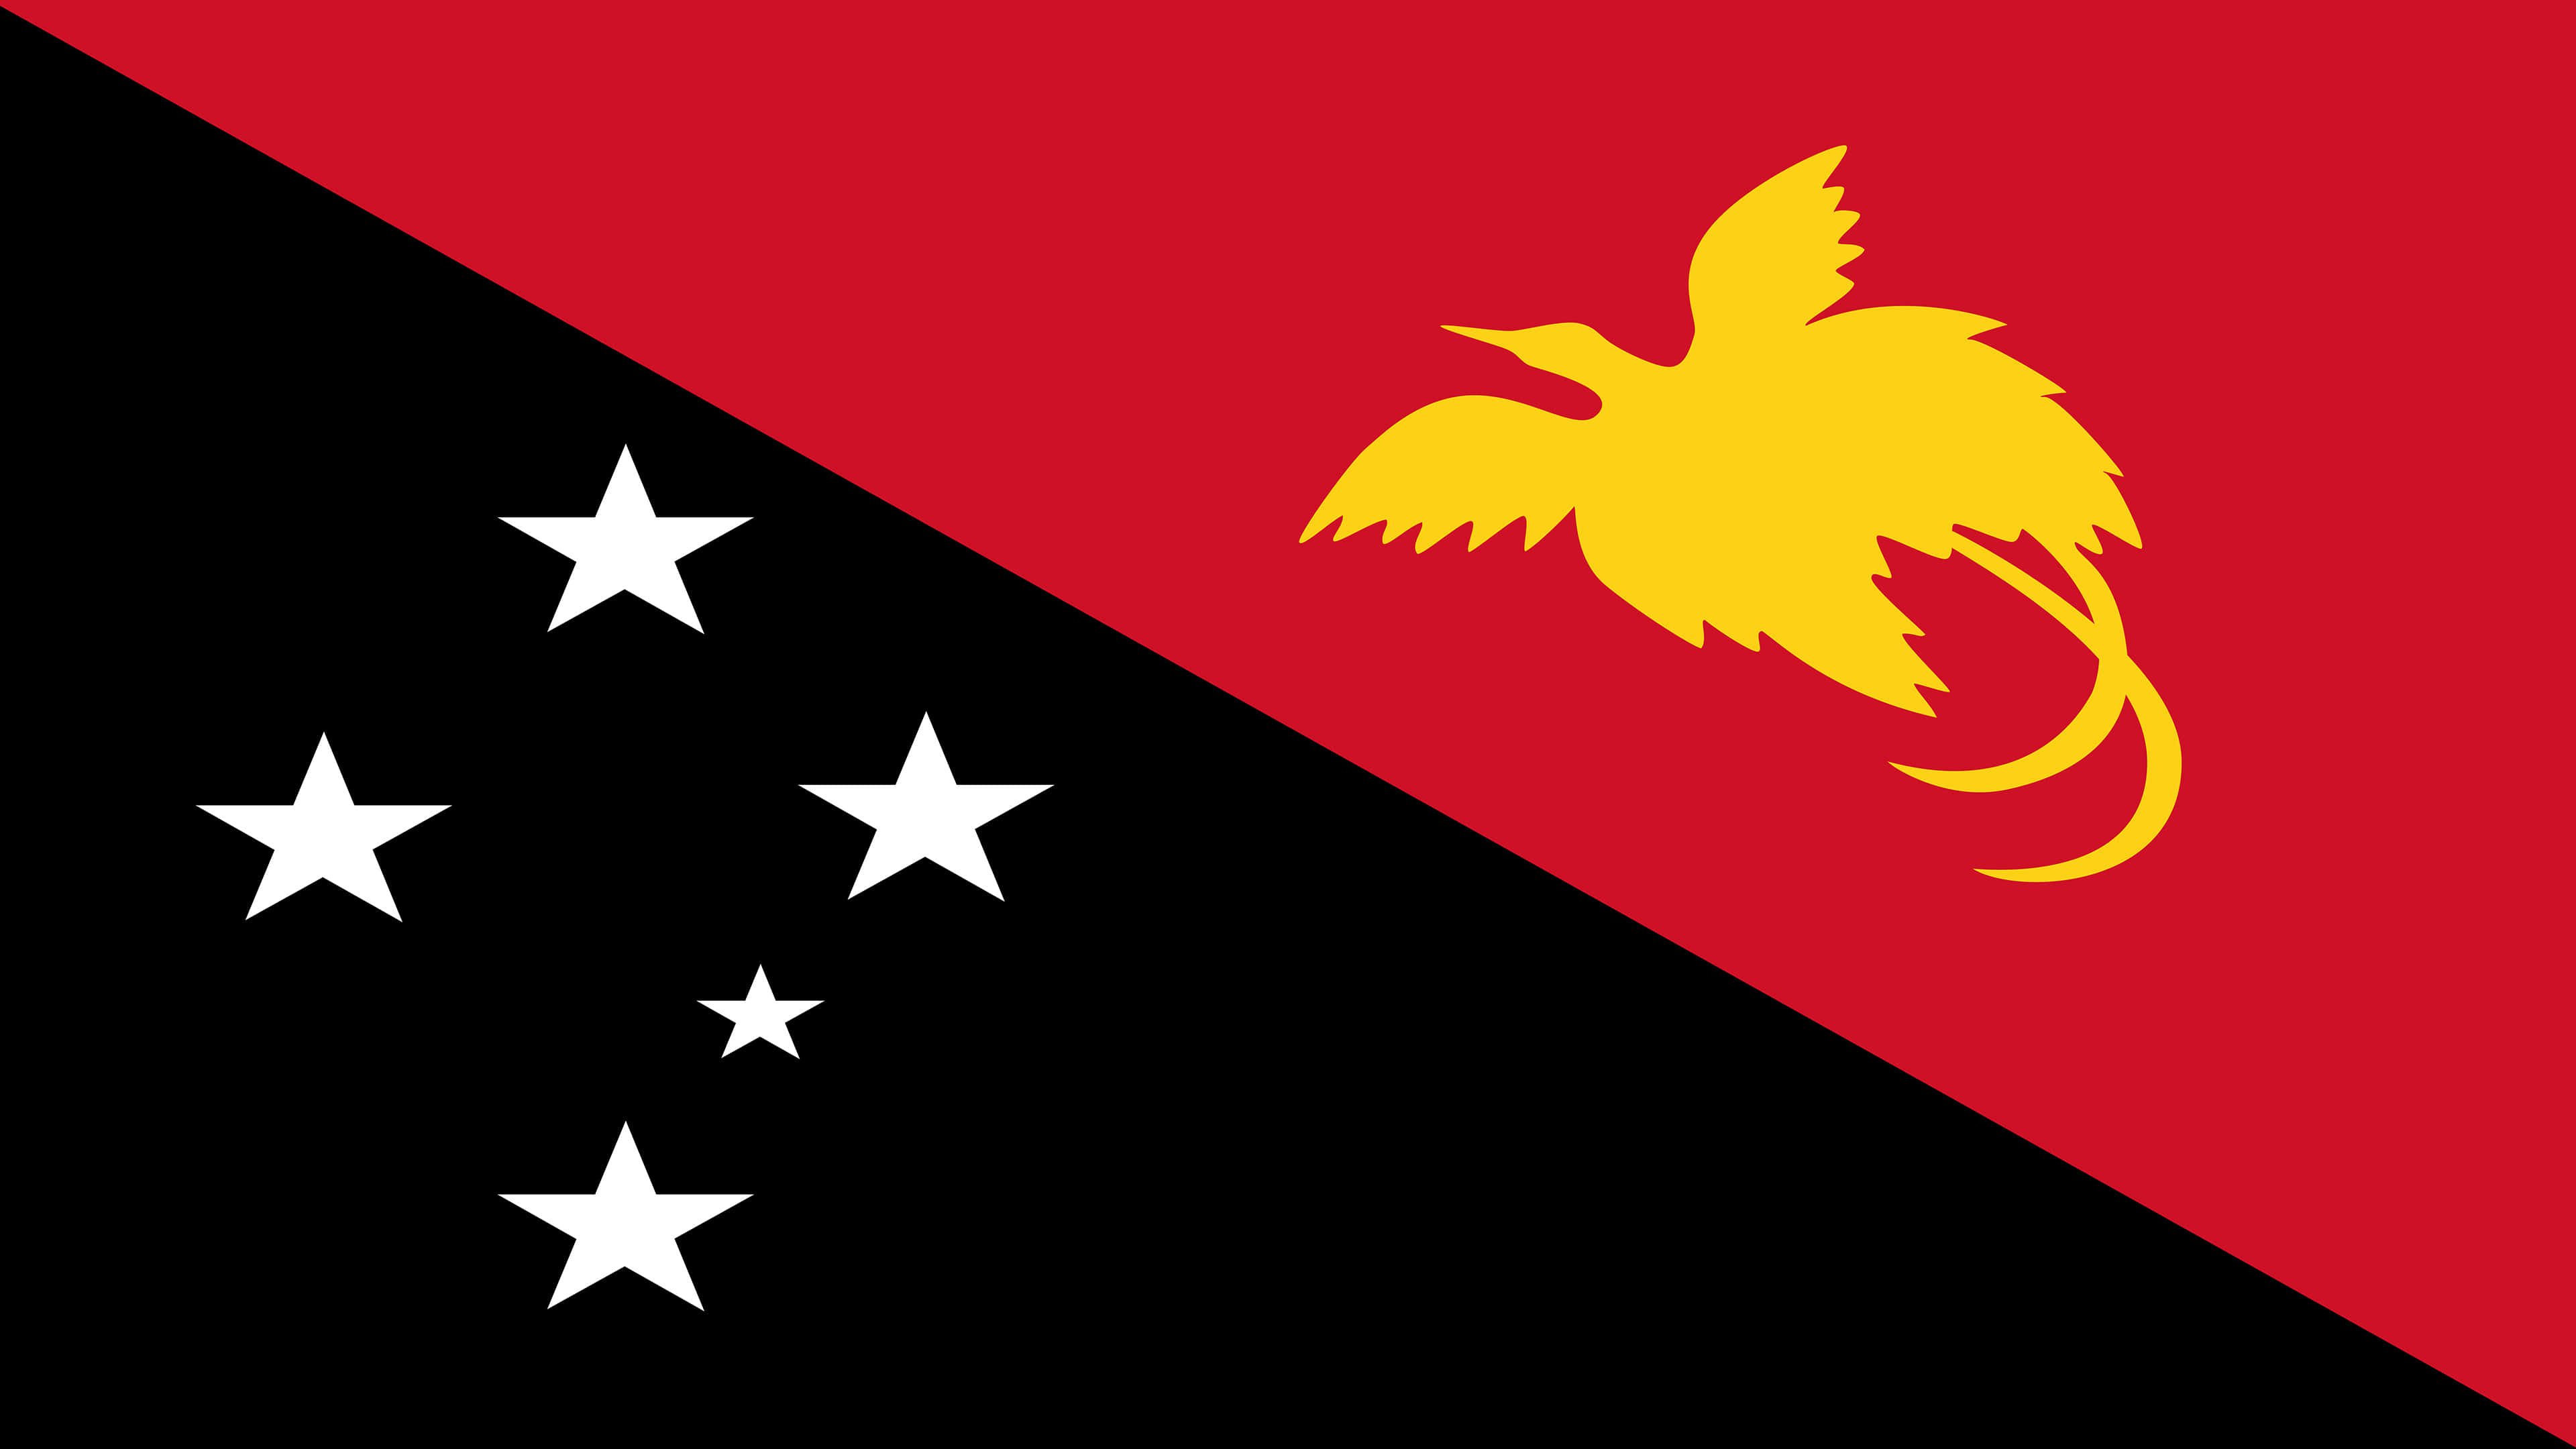 Papua New Guinea Flag UHD 4K Wallpaper Pixelz 3840x2160